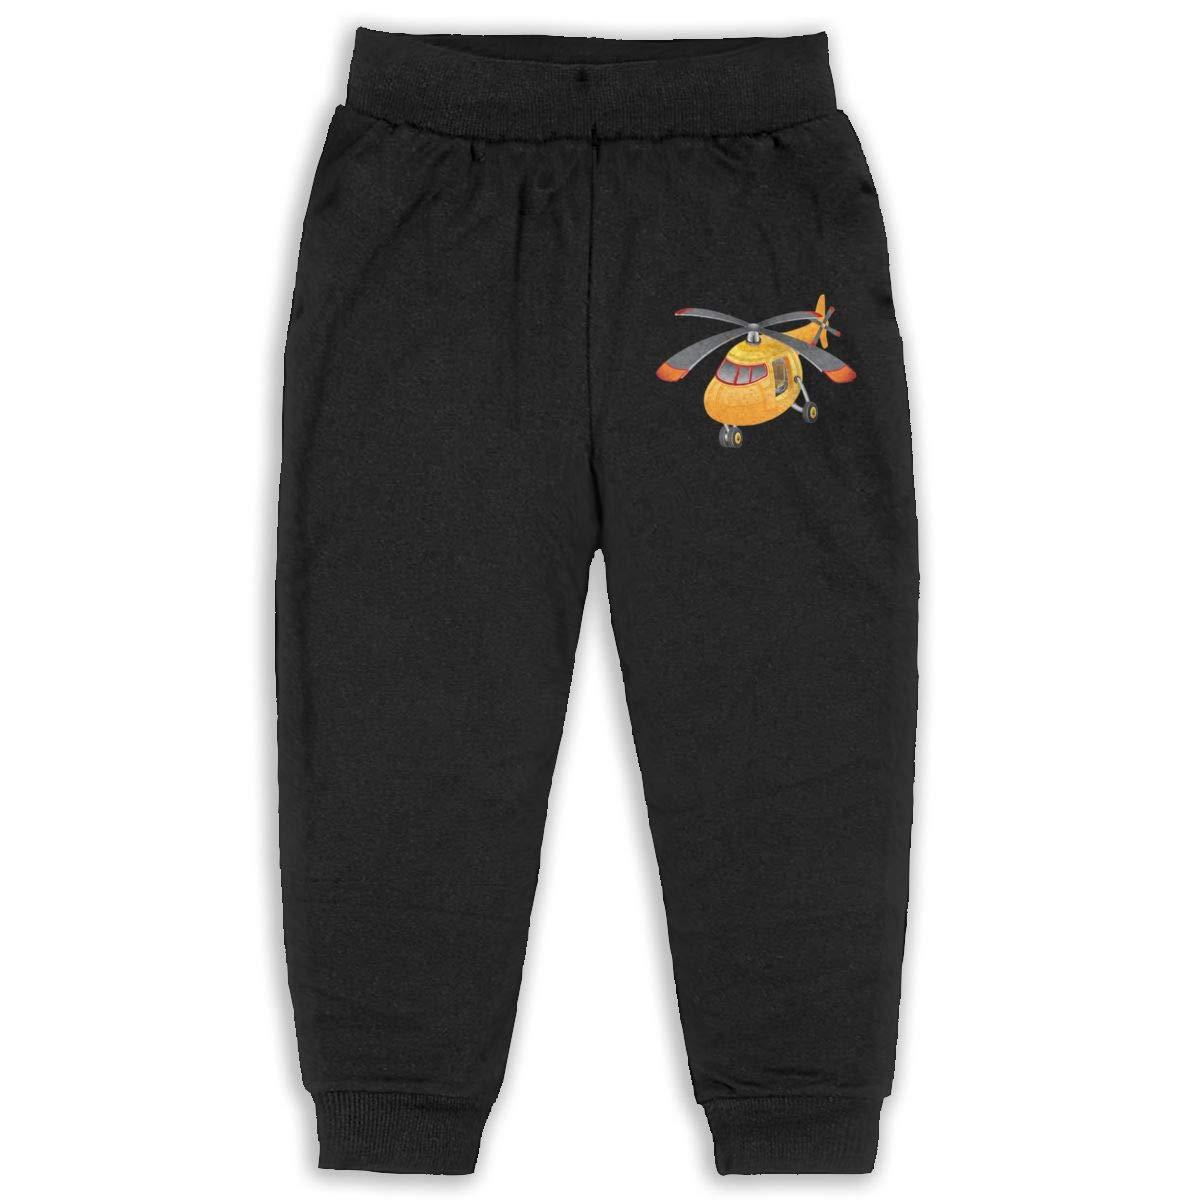 LFCLOSET Orange Cartoon Aircraft Children Cartoon Cotton Sweatpants Sport Jogger Elastic Pants